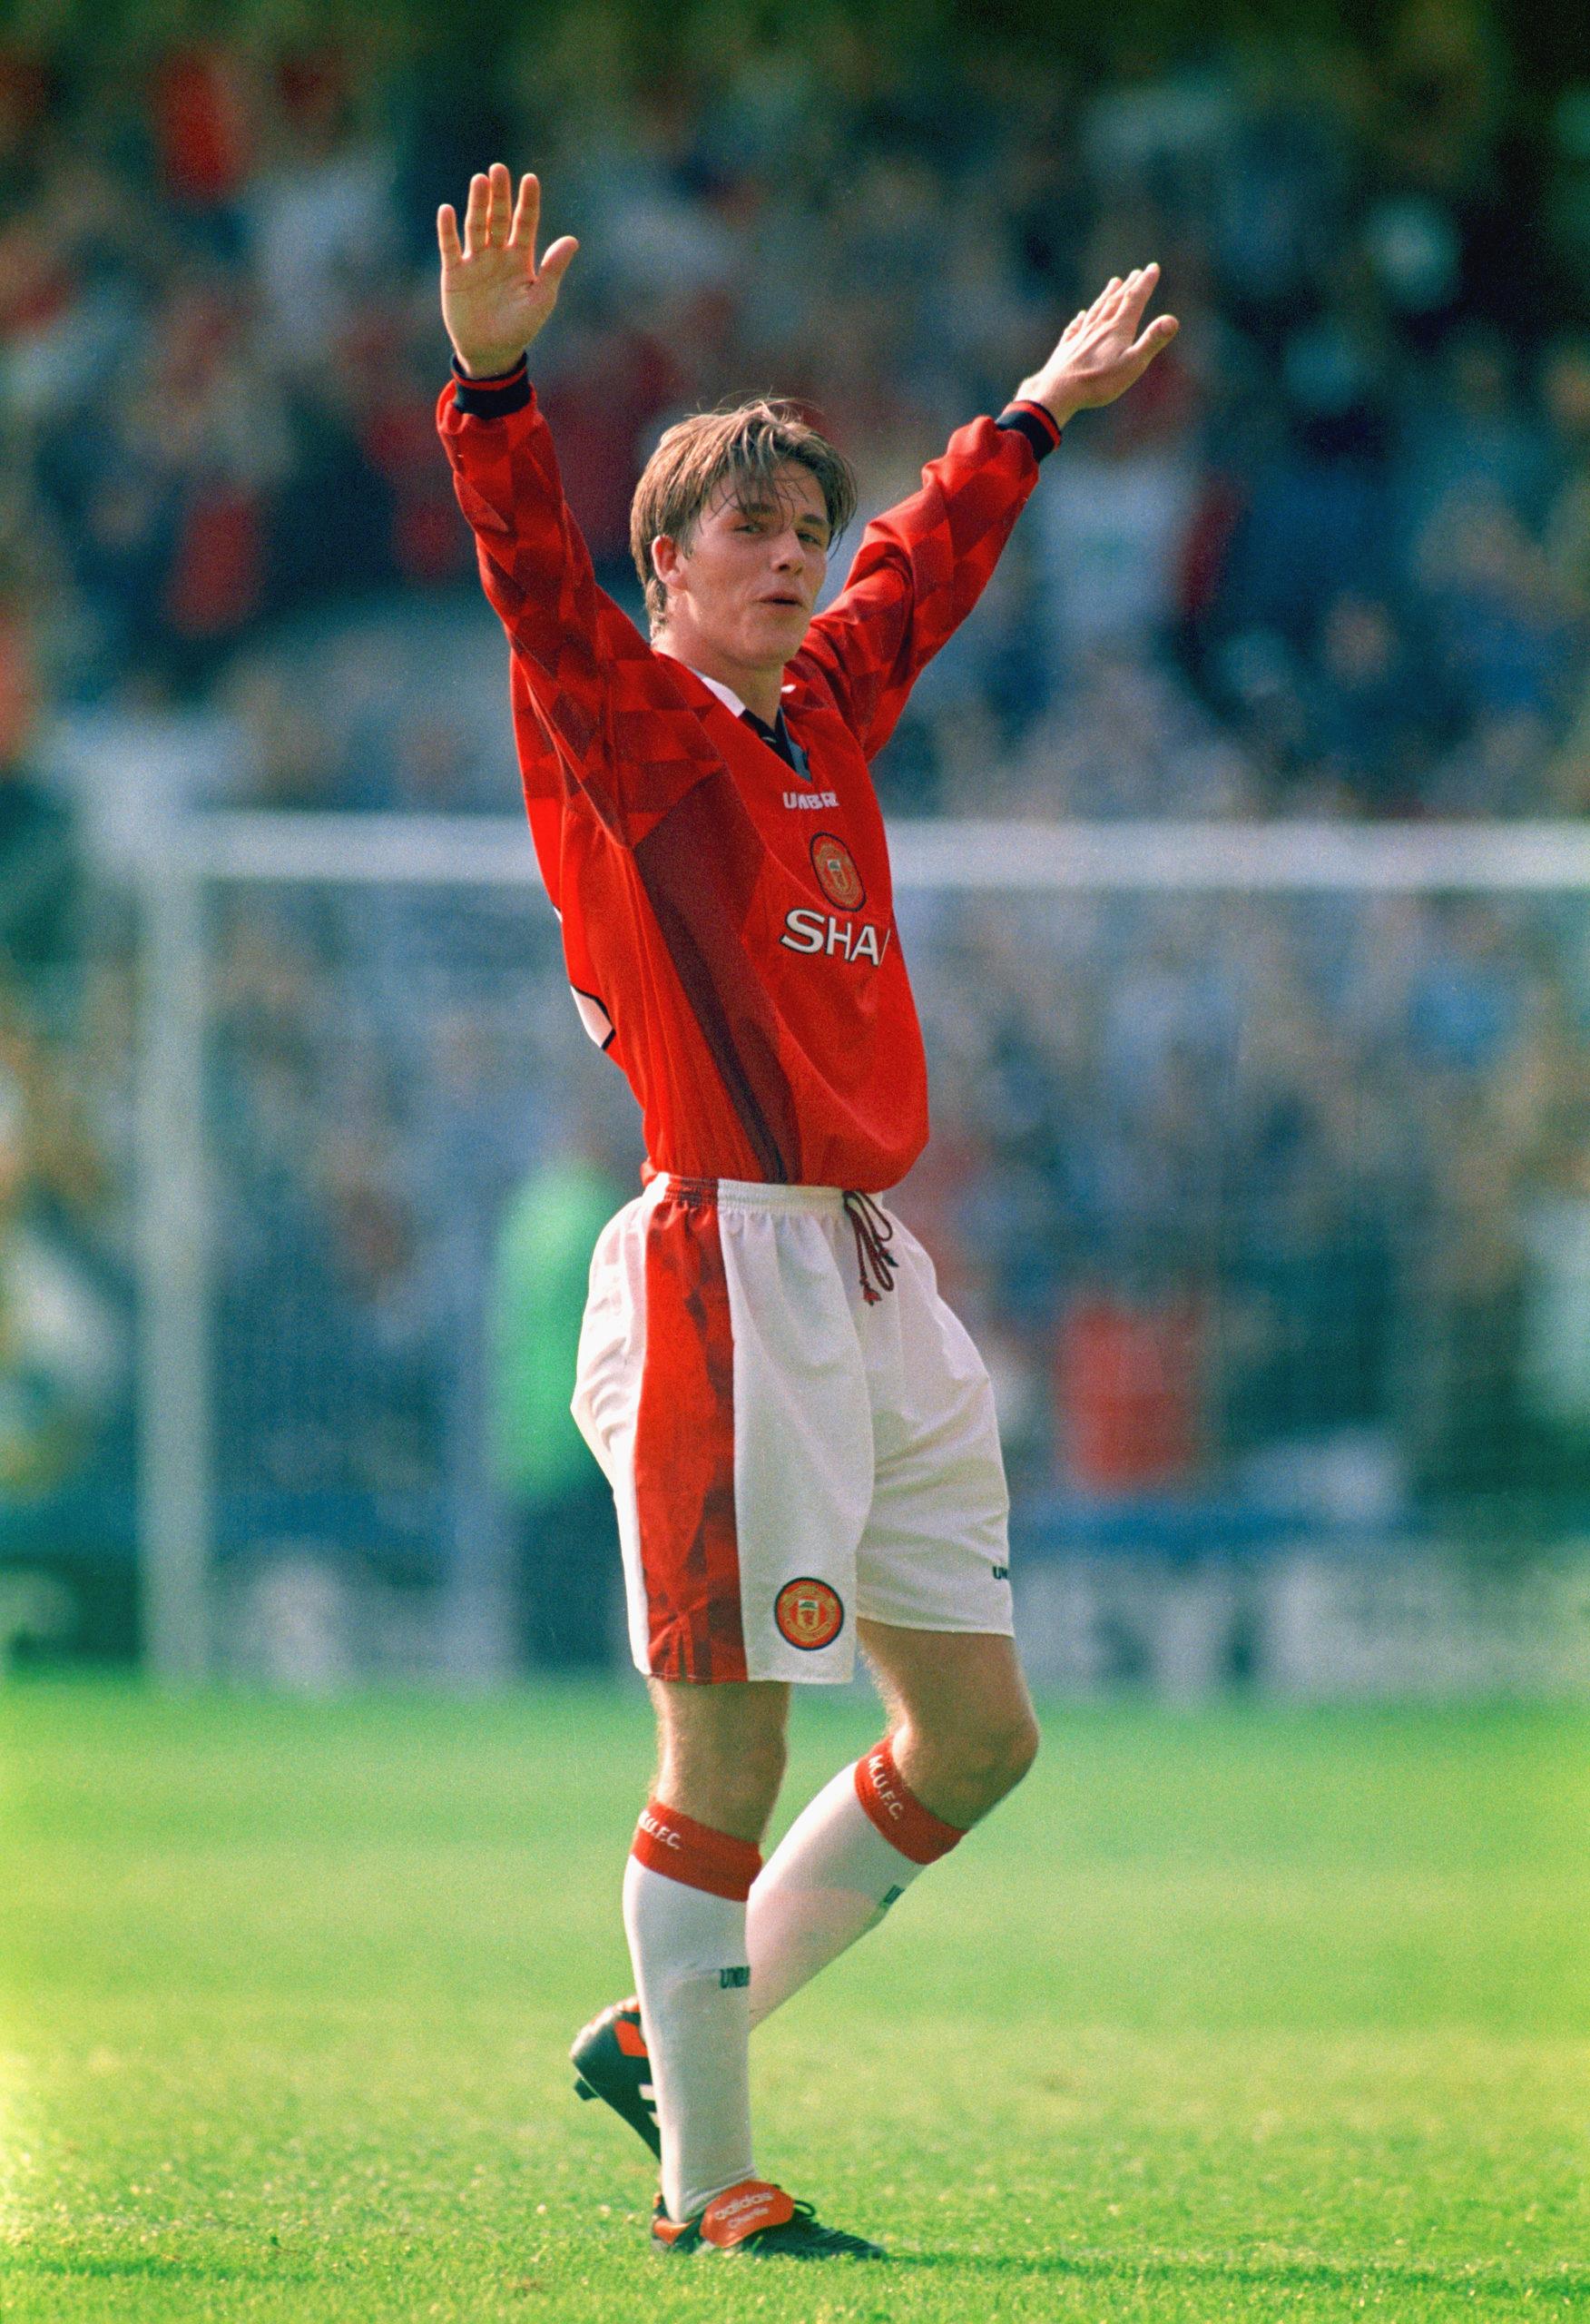 Дэвид Бекхэм, 1996. Фото: Michael Cooper/Allsport/Getty Images